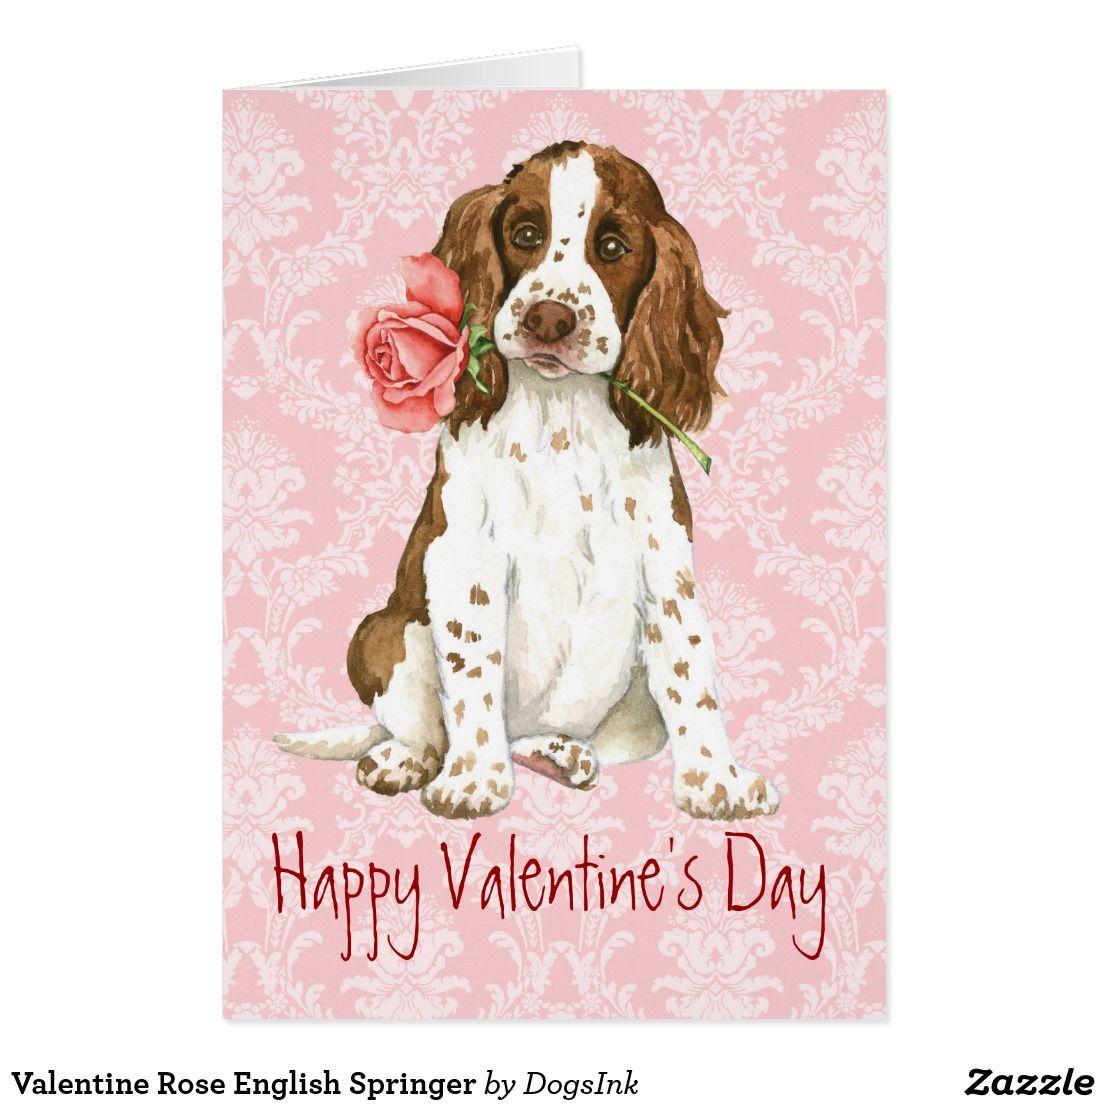 Valentine Rose English Springer Holiday Card Zazzle Com In 2020 Valentines Roses English Springer Springer